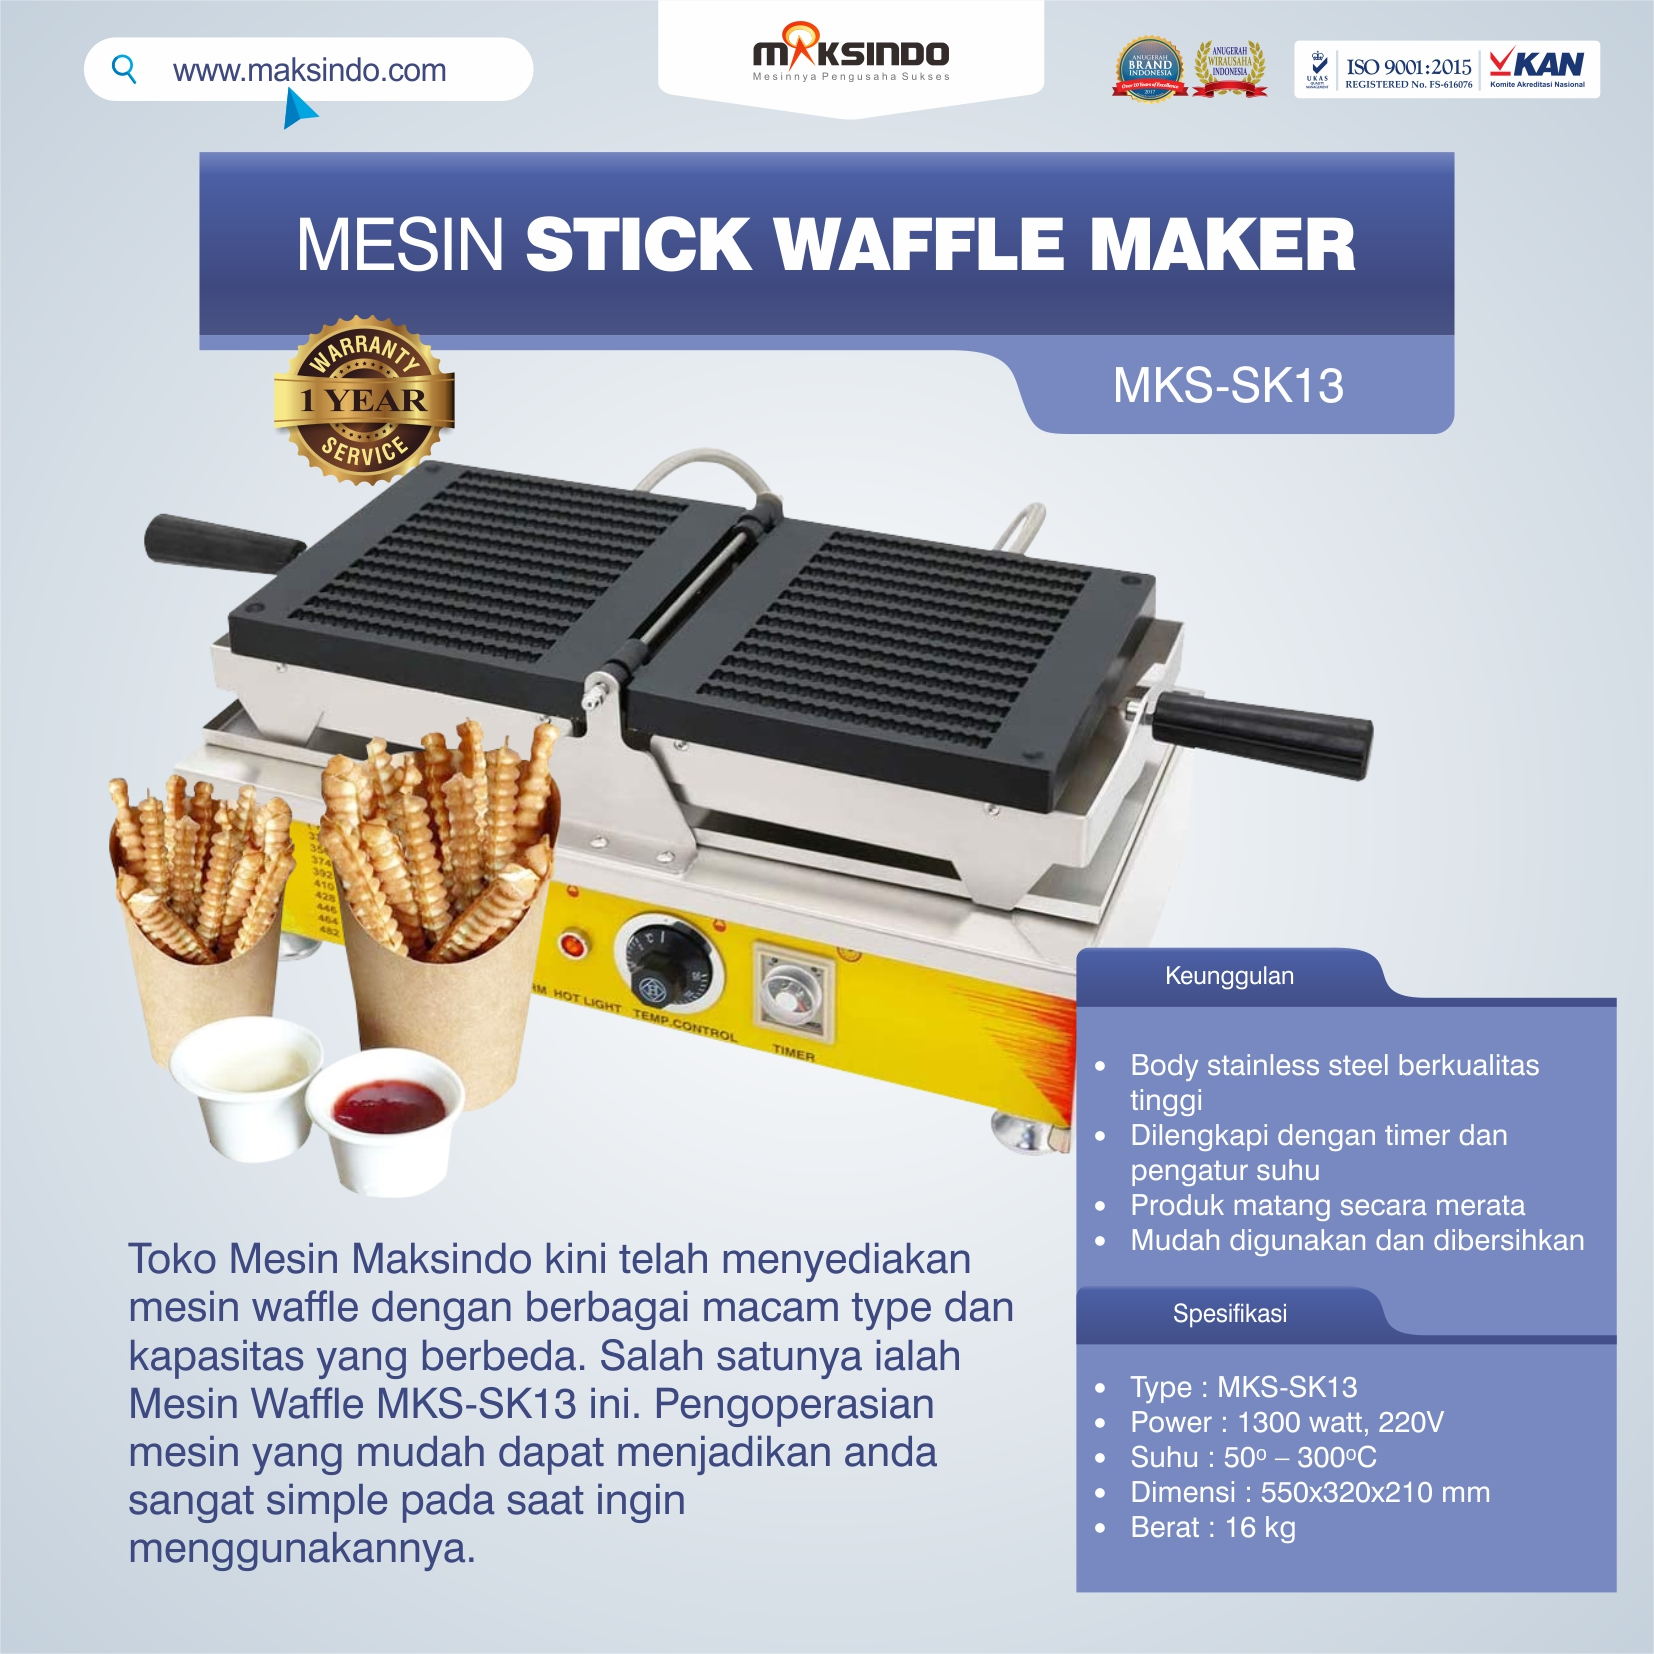 Mesin Waffle Bentuk Lollipop (Waffle Maker) MKS-SK13